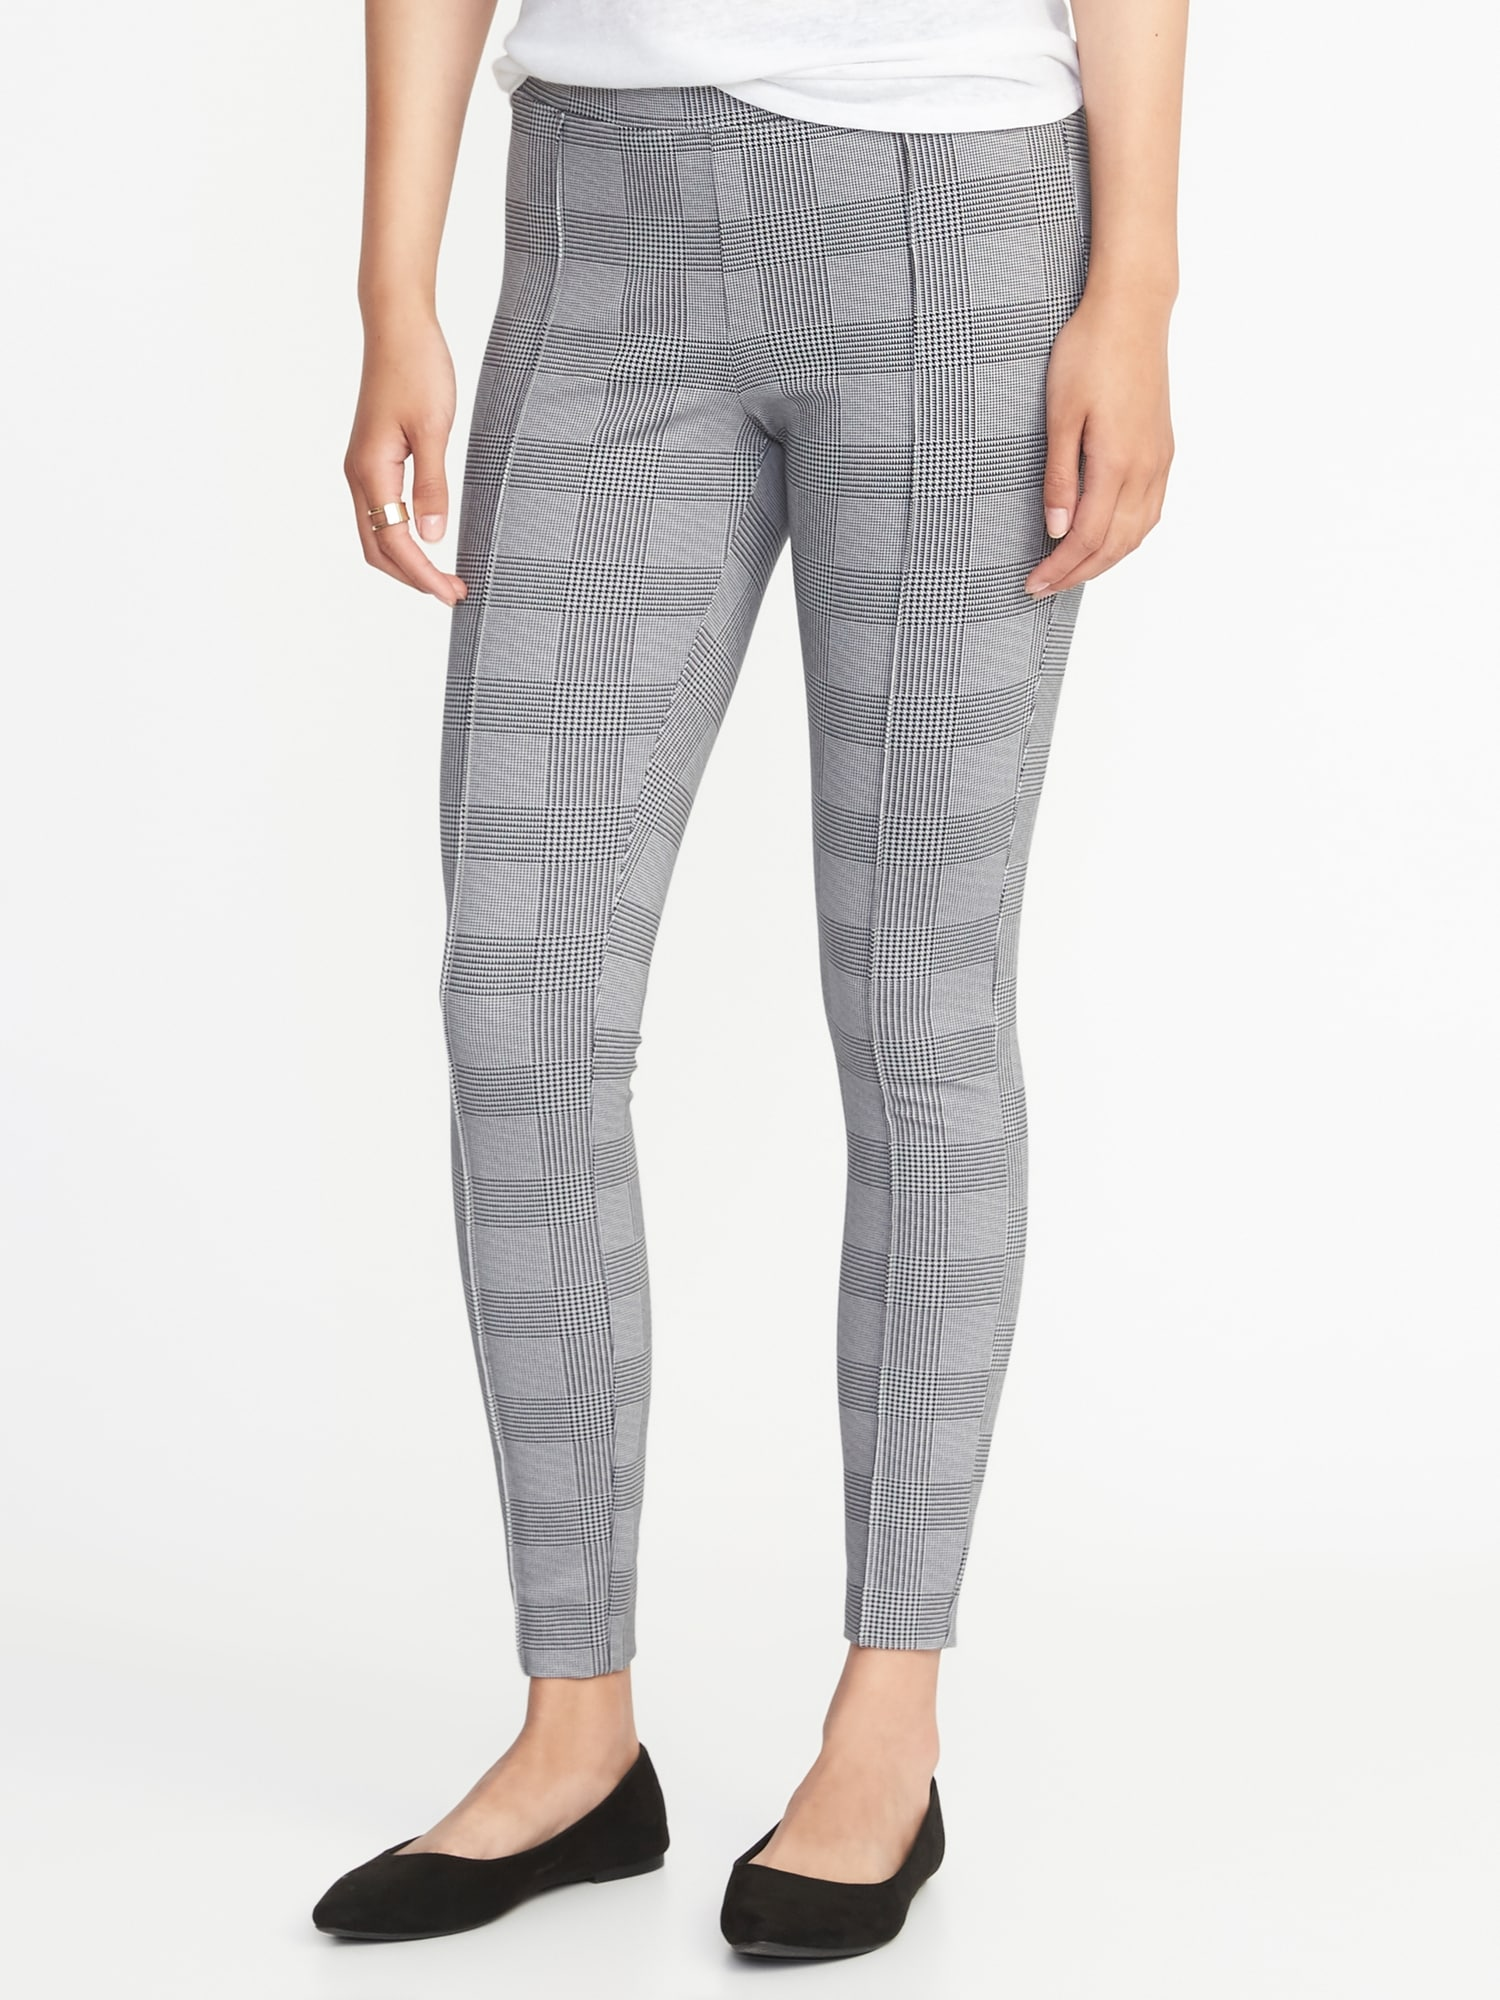 a55749756b718 High-Rise Stevie Ponte-Knit Pants for Women